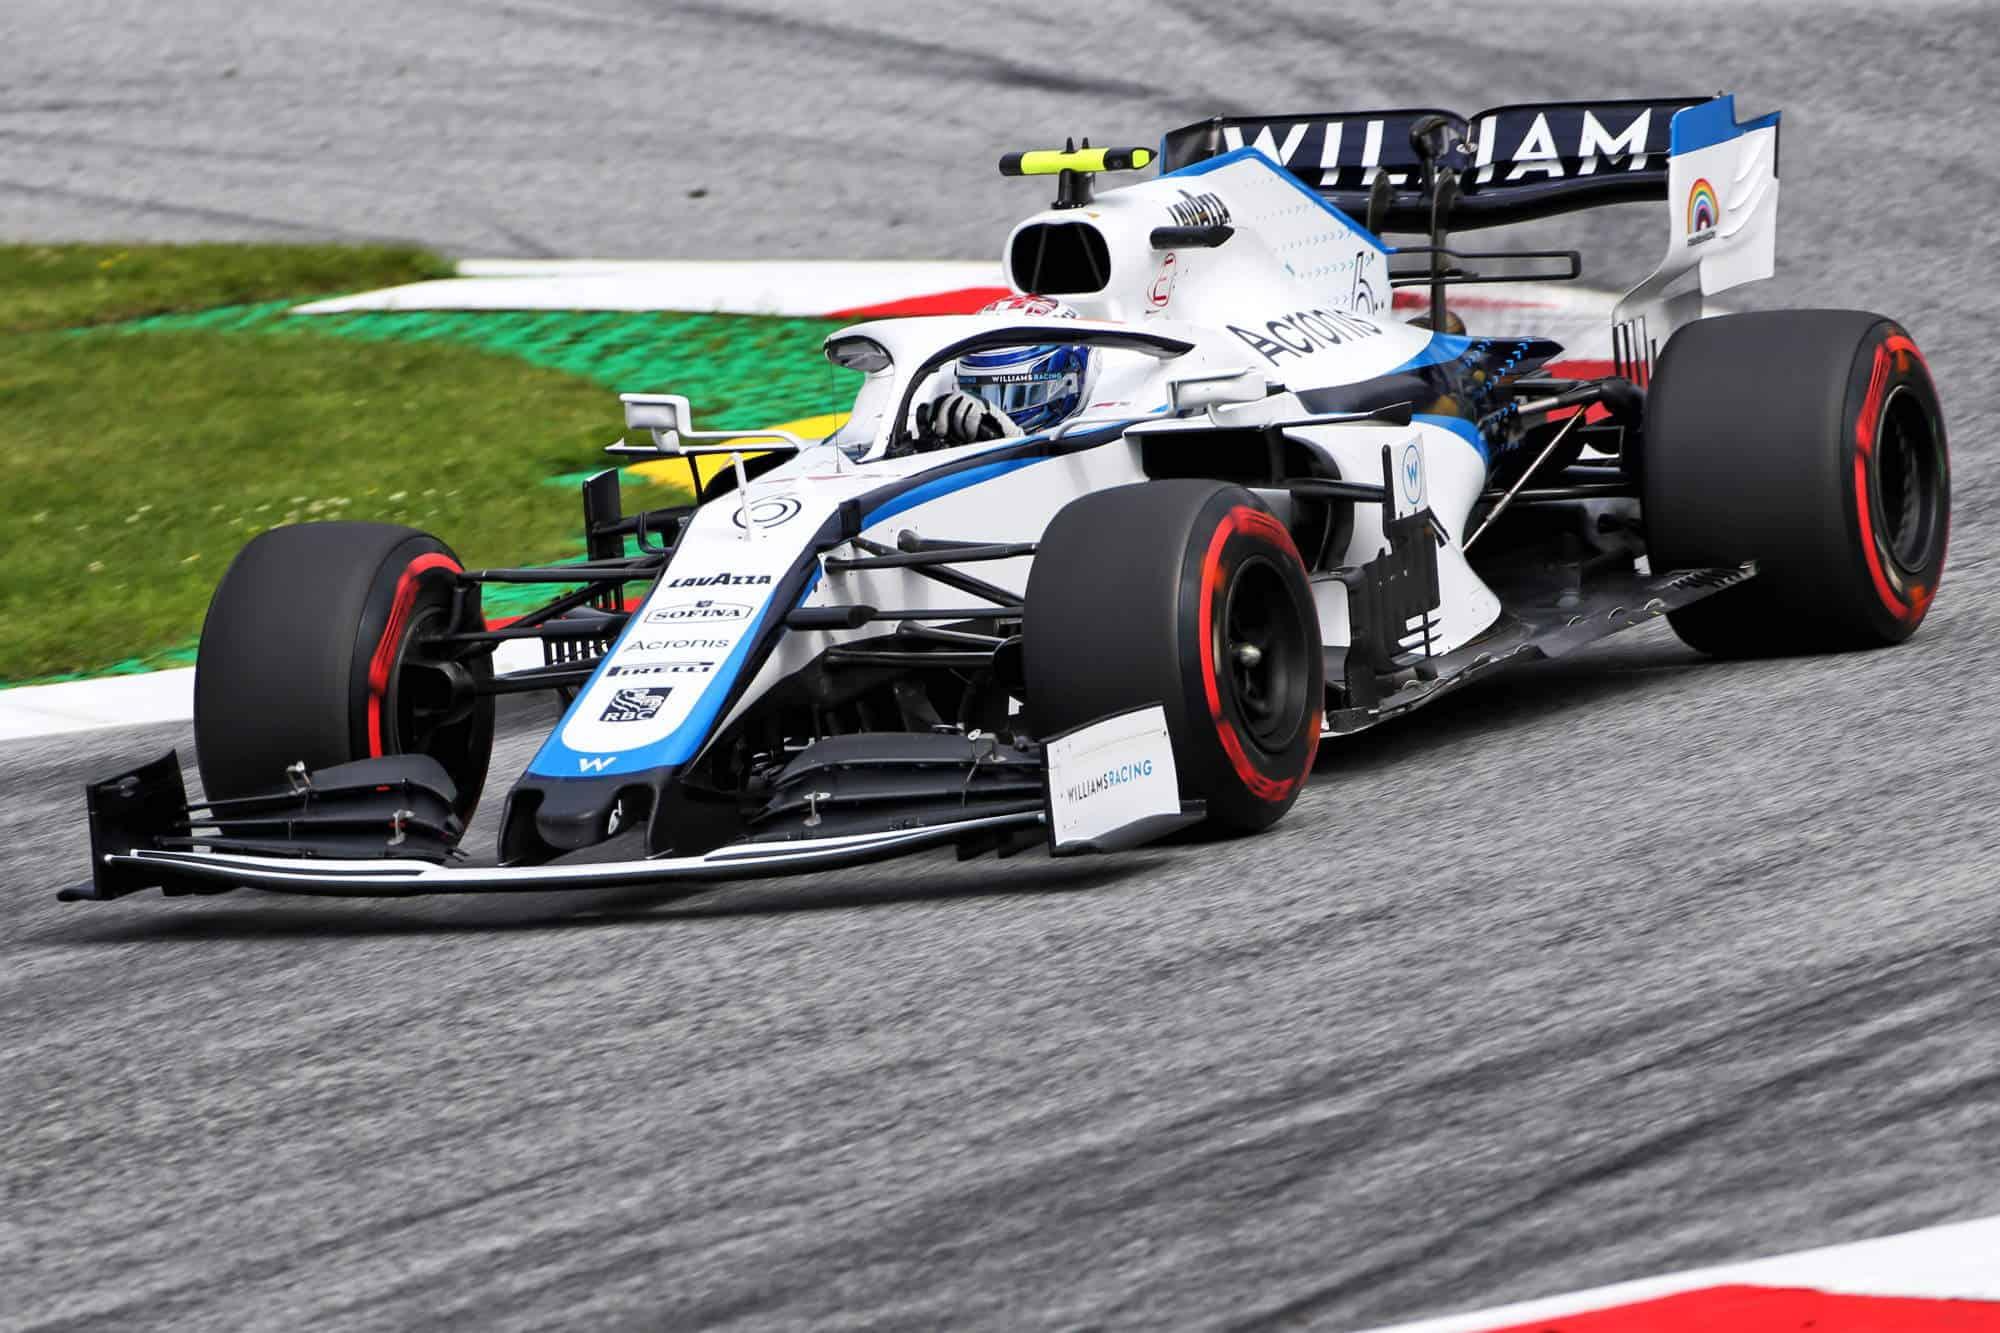 2020 Austrian GP Nicholas Latifi Williams FW43 Photo Williams